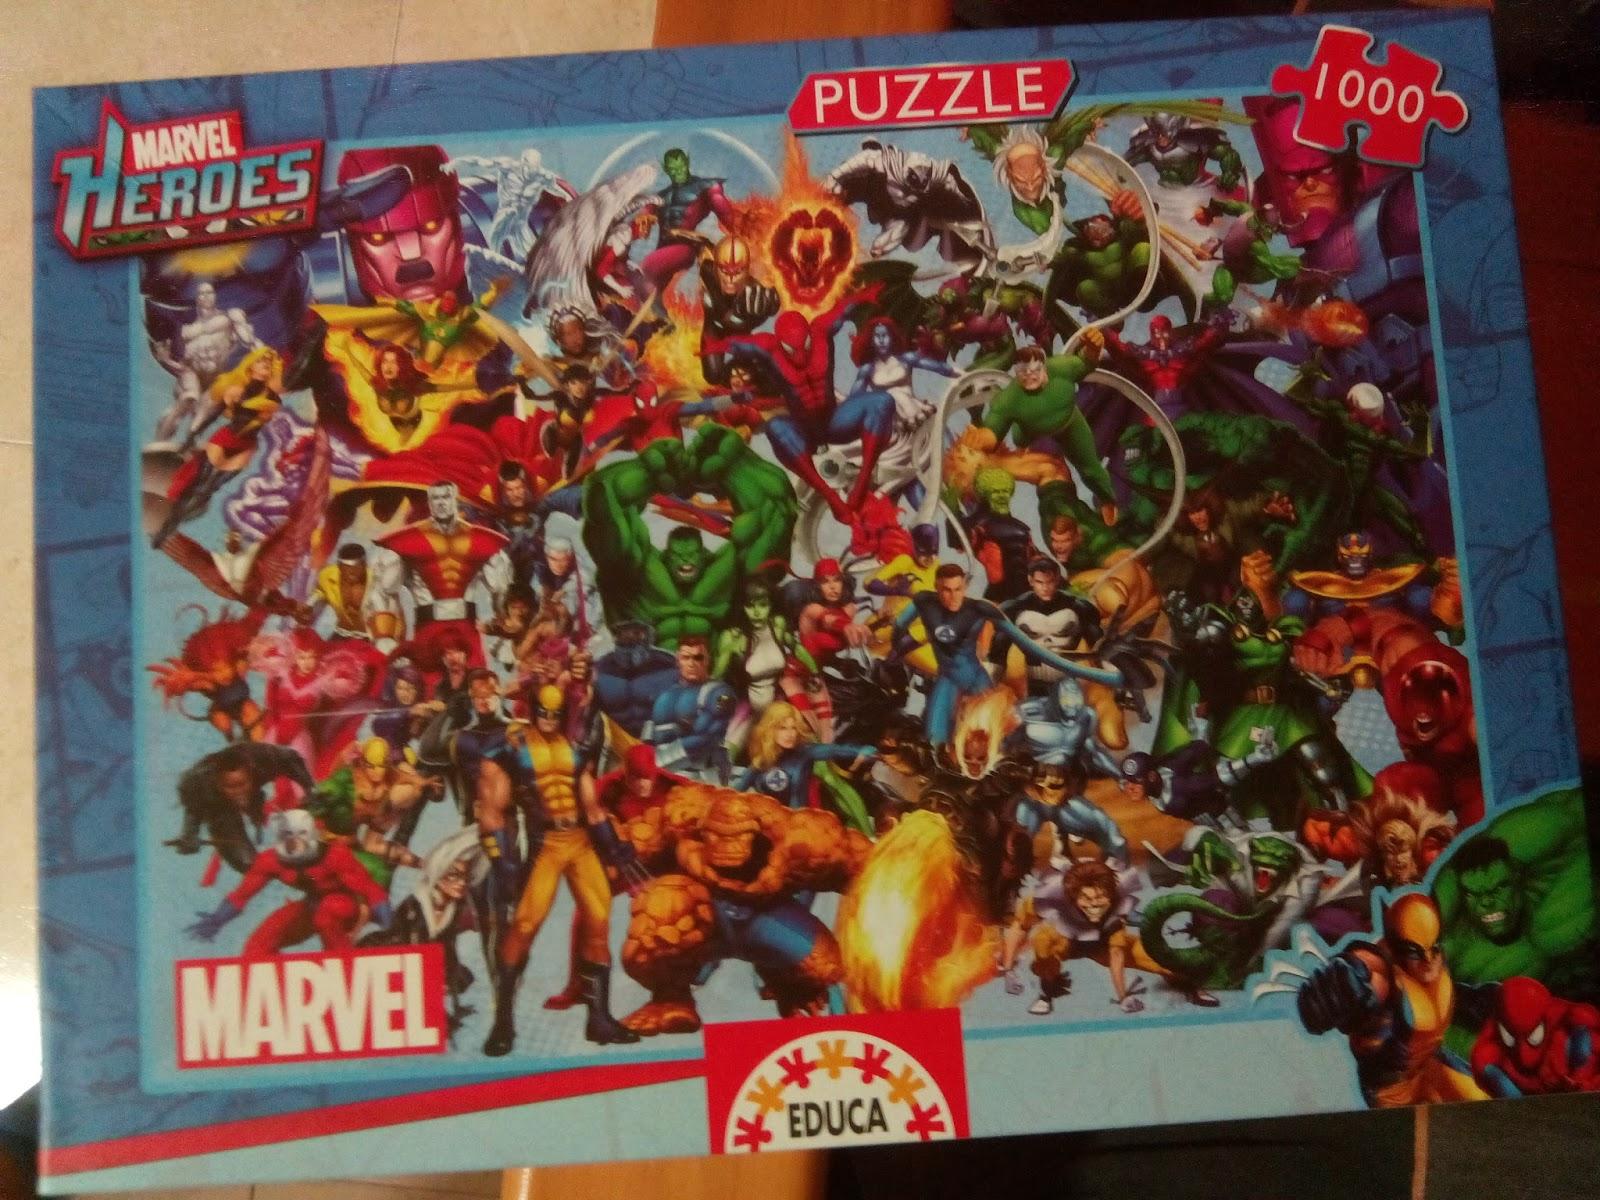 La caja del puzzle